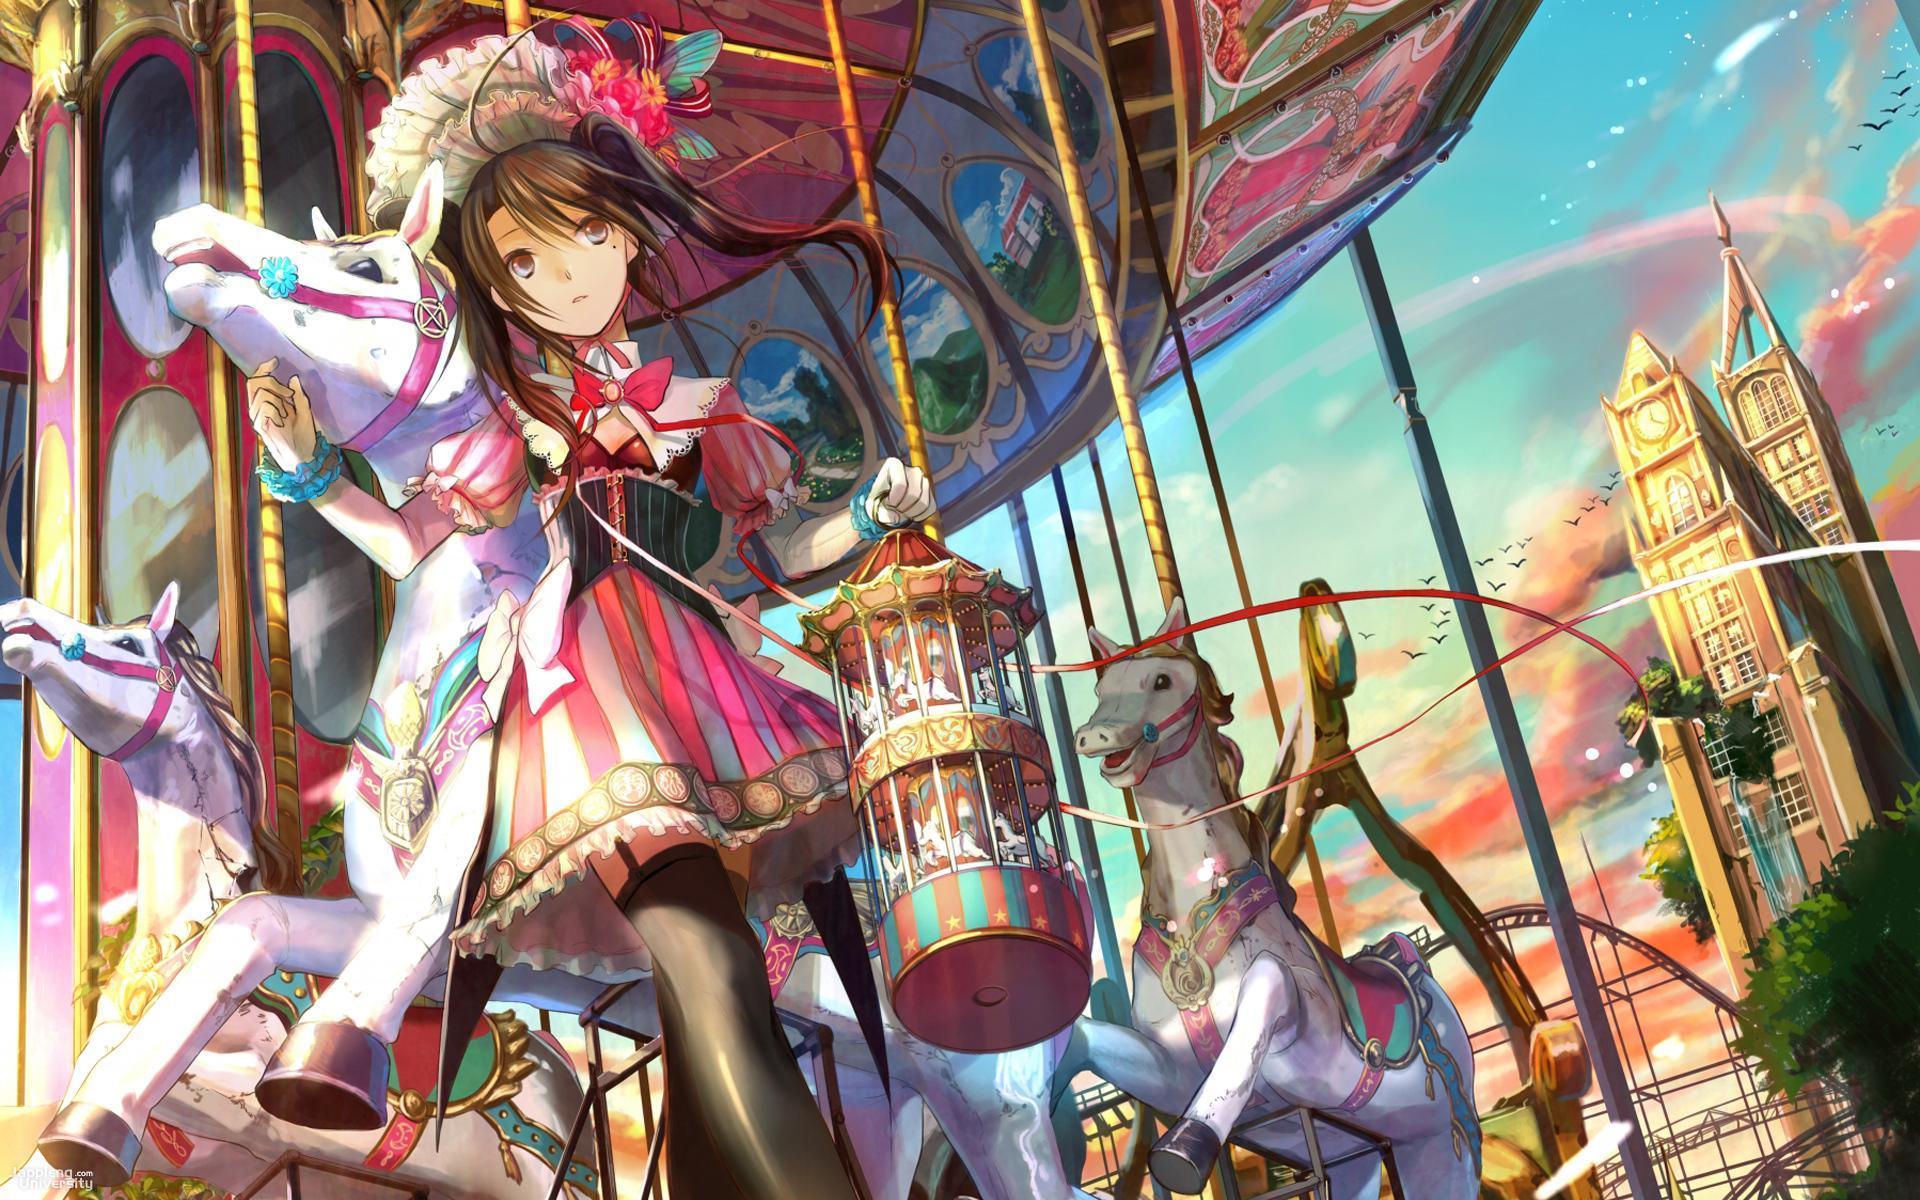 Japanese Cartoon Art Wallpapers Top Free Japanese Cartoon Art Backgrounds Wallpaperaccess